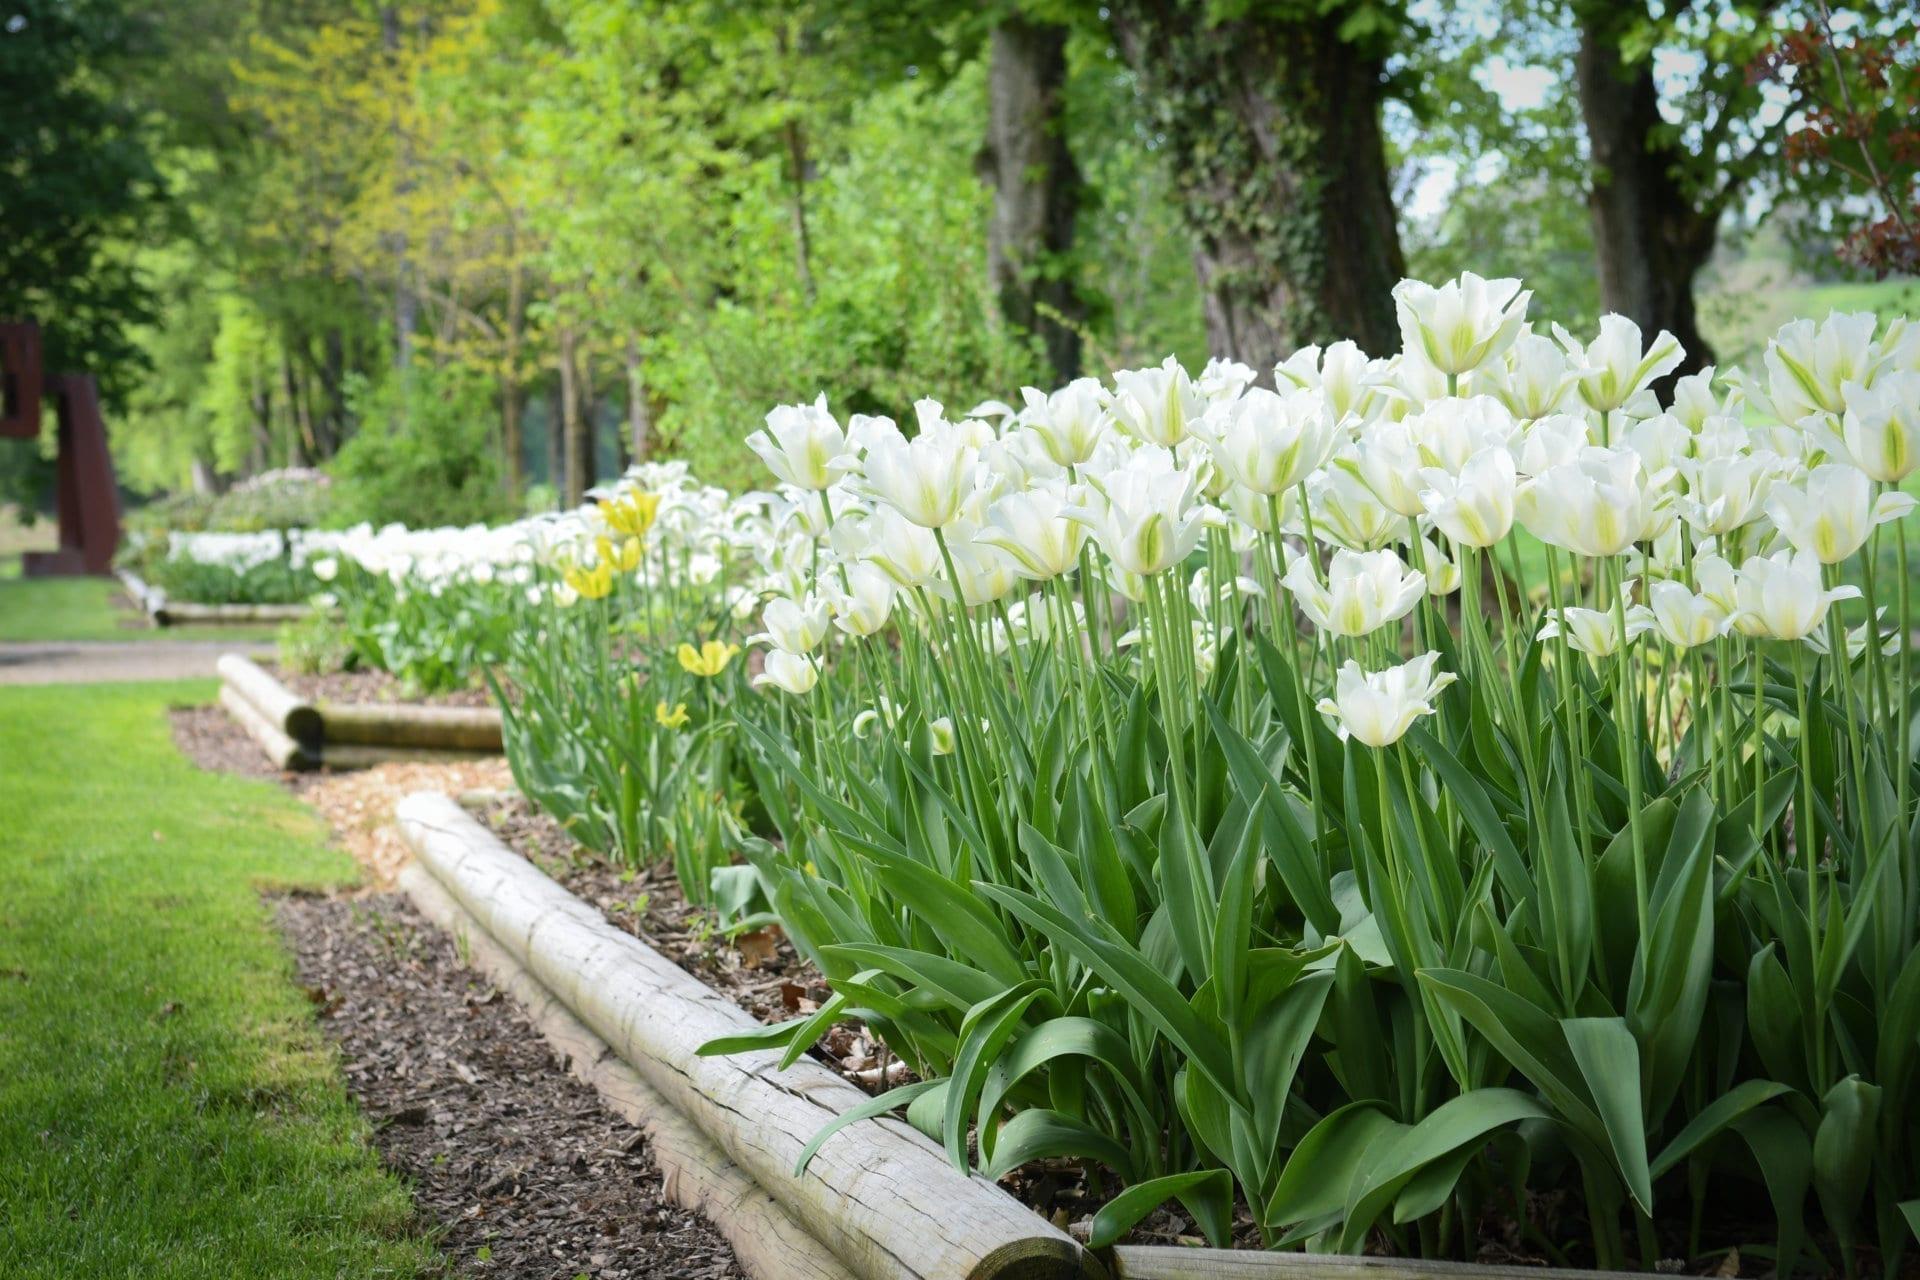 Tulipes blanche dans le jardin de Daria.